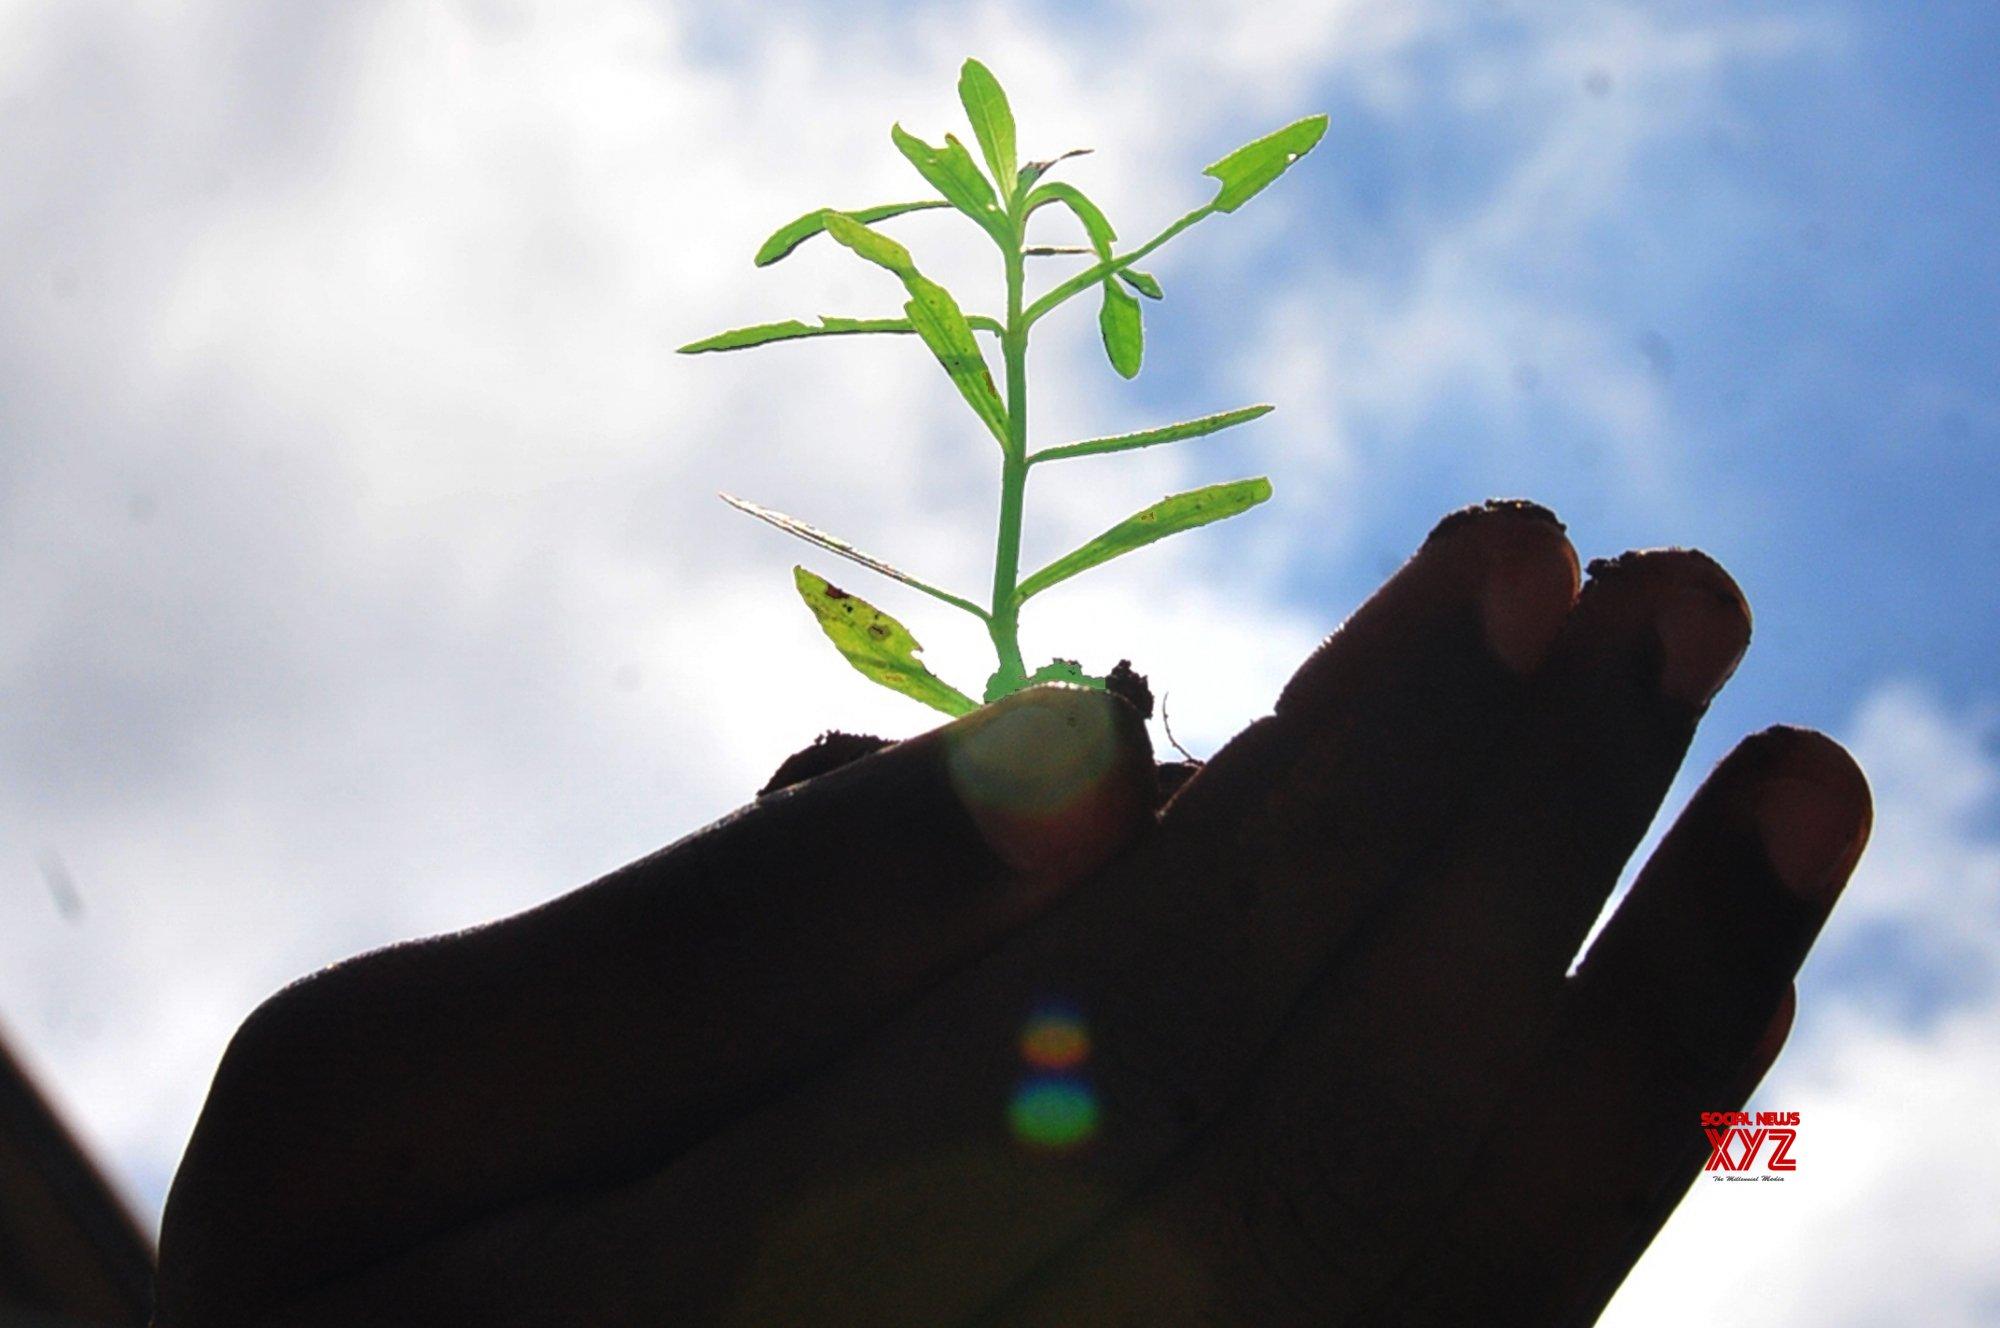 UP launching major plantation drive for 'miracle' Sahjan tree